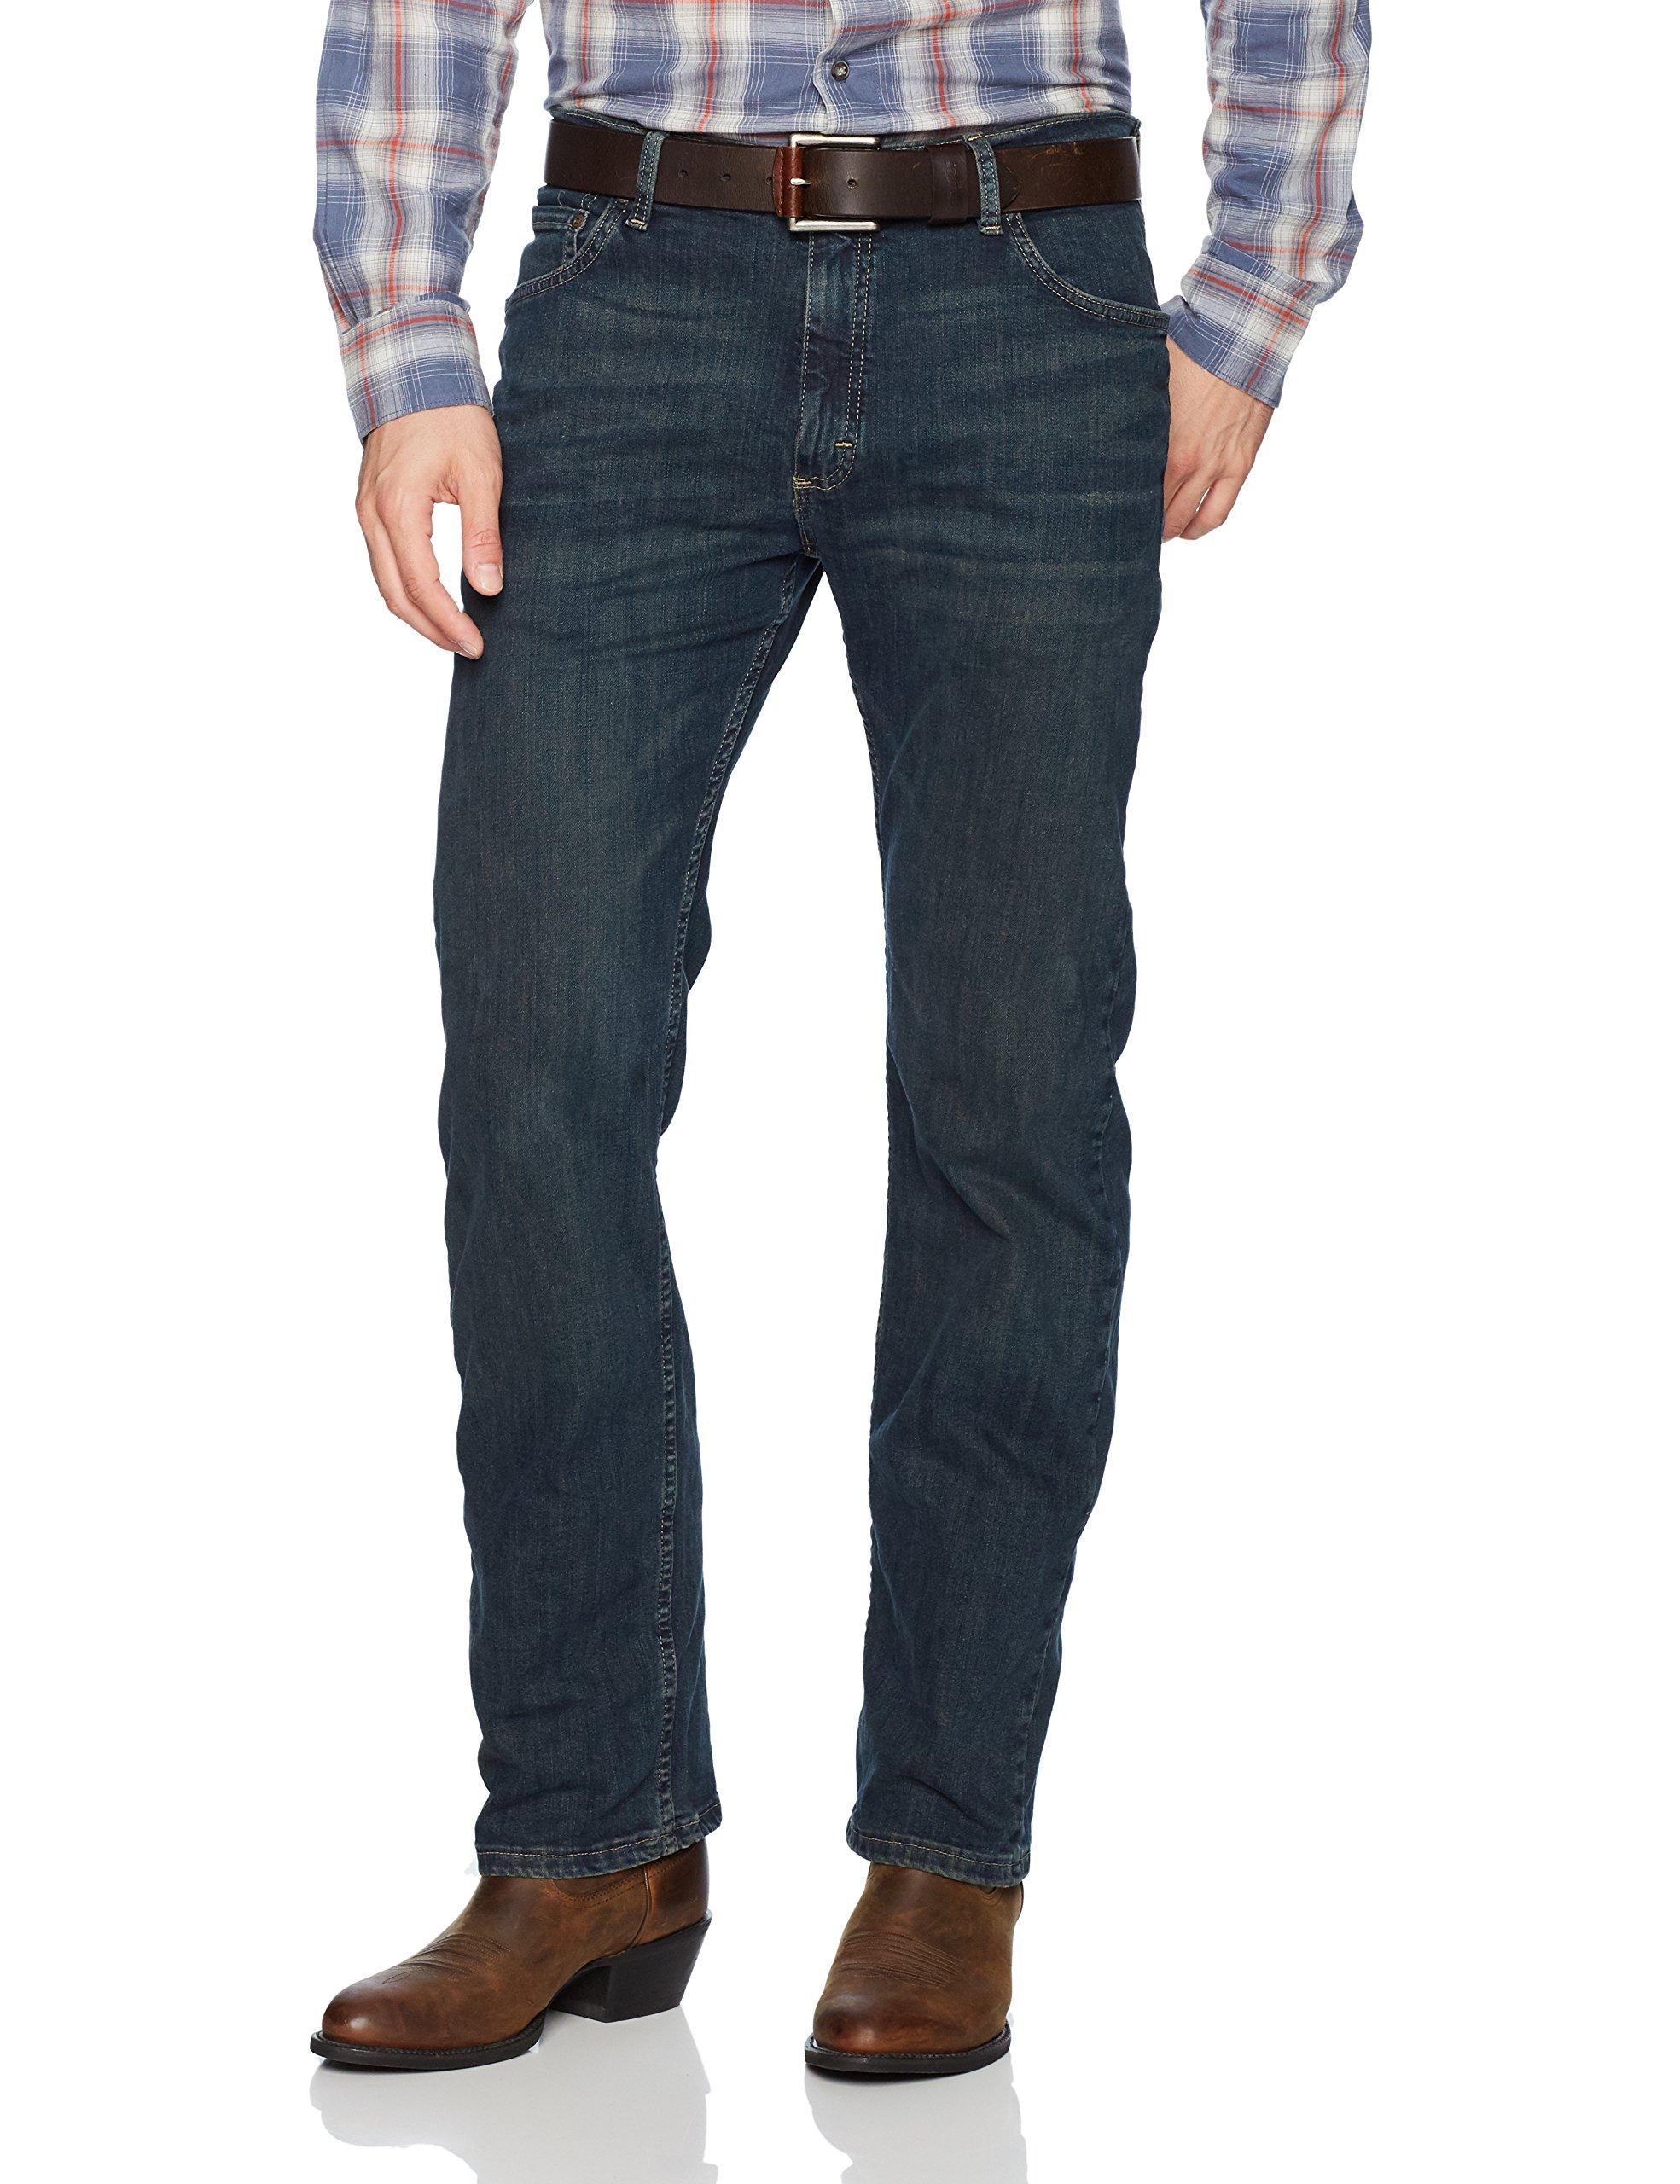 Wrangler Authentics Men's Classic Straight Leg Jean, Homestead Blue Flex, 34 X 30